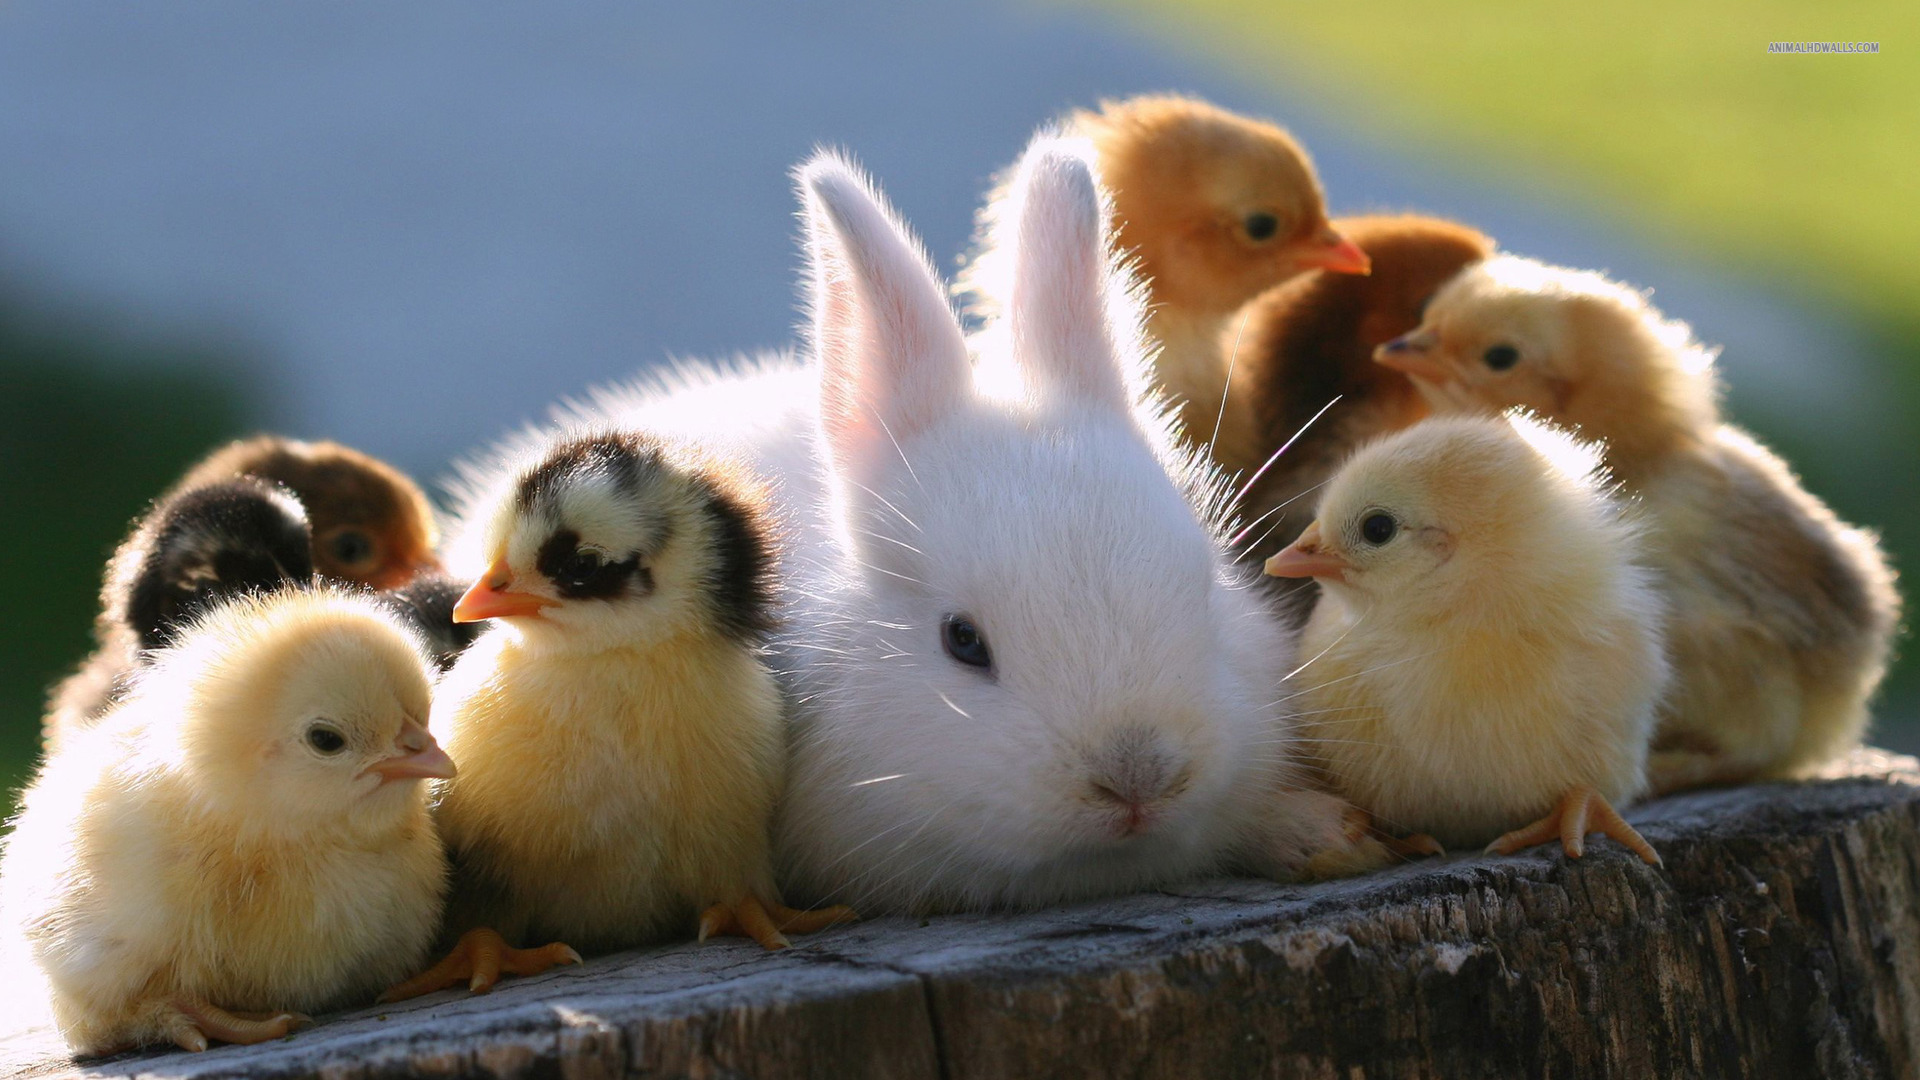 Fun Rabbit Animals Wallpaper Screensaver